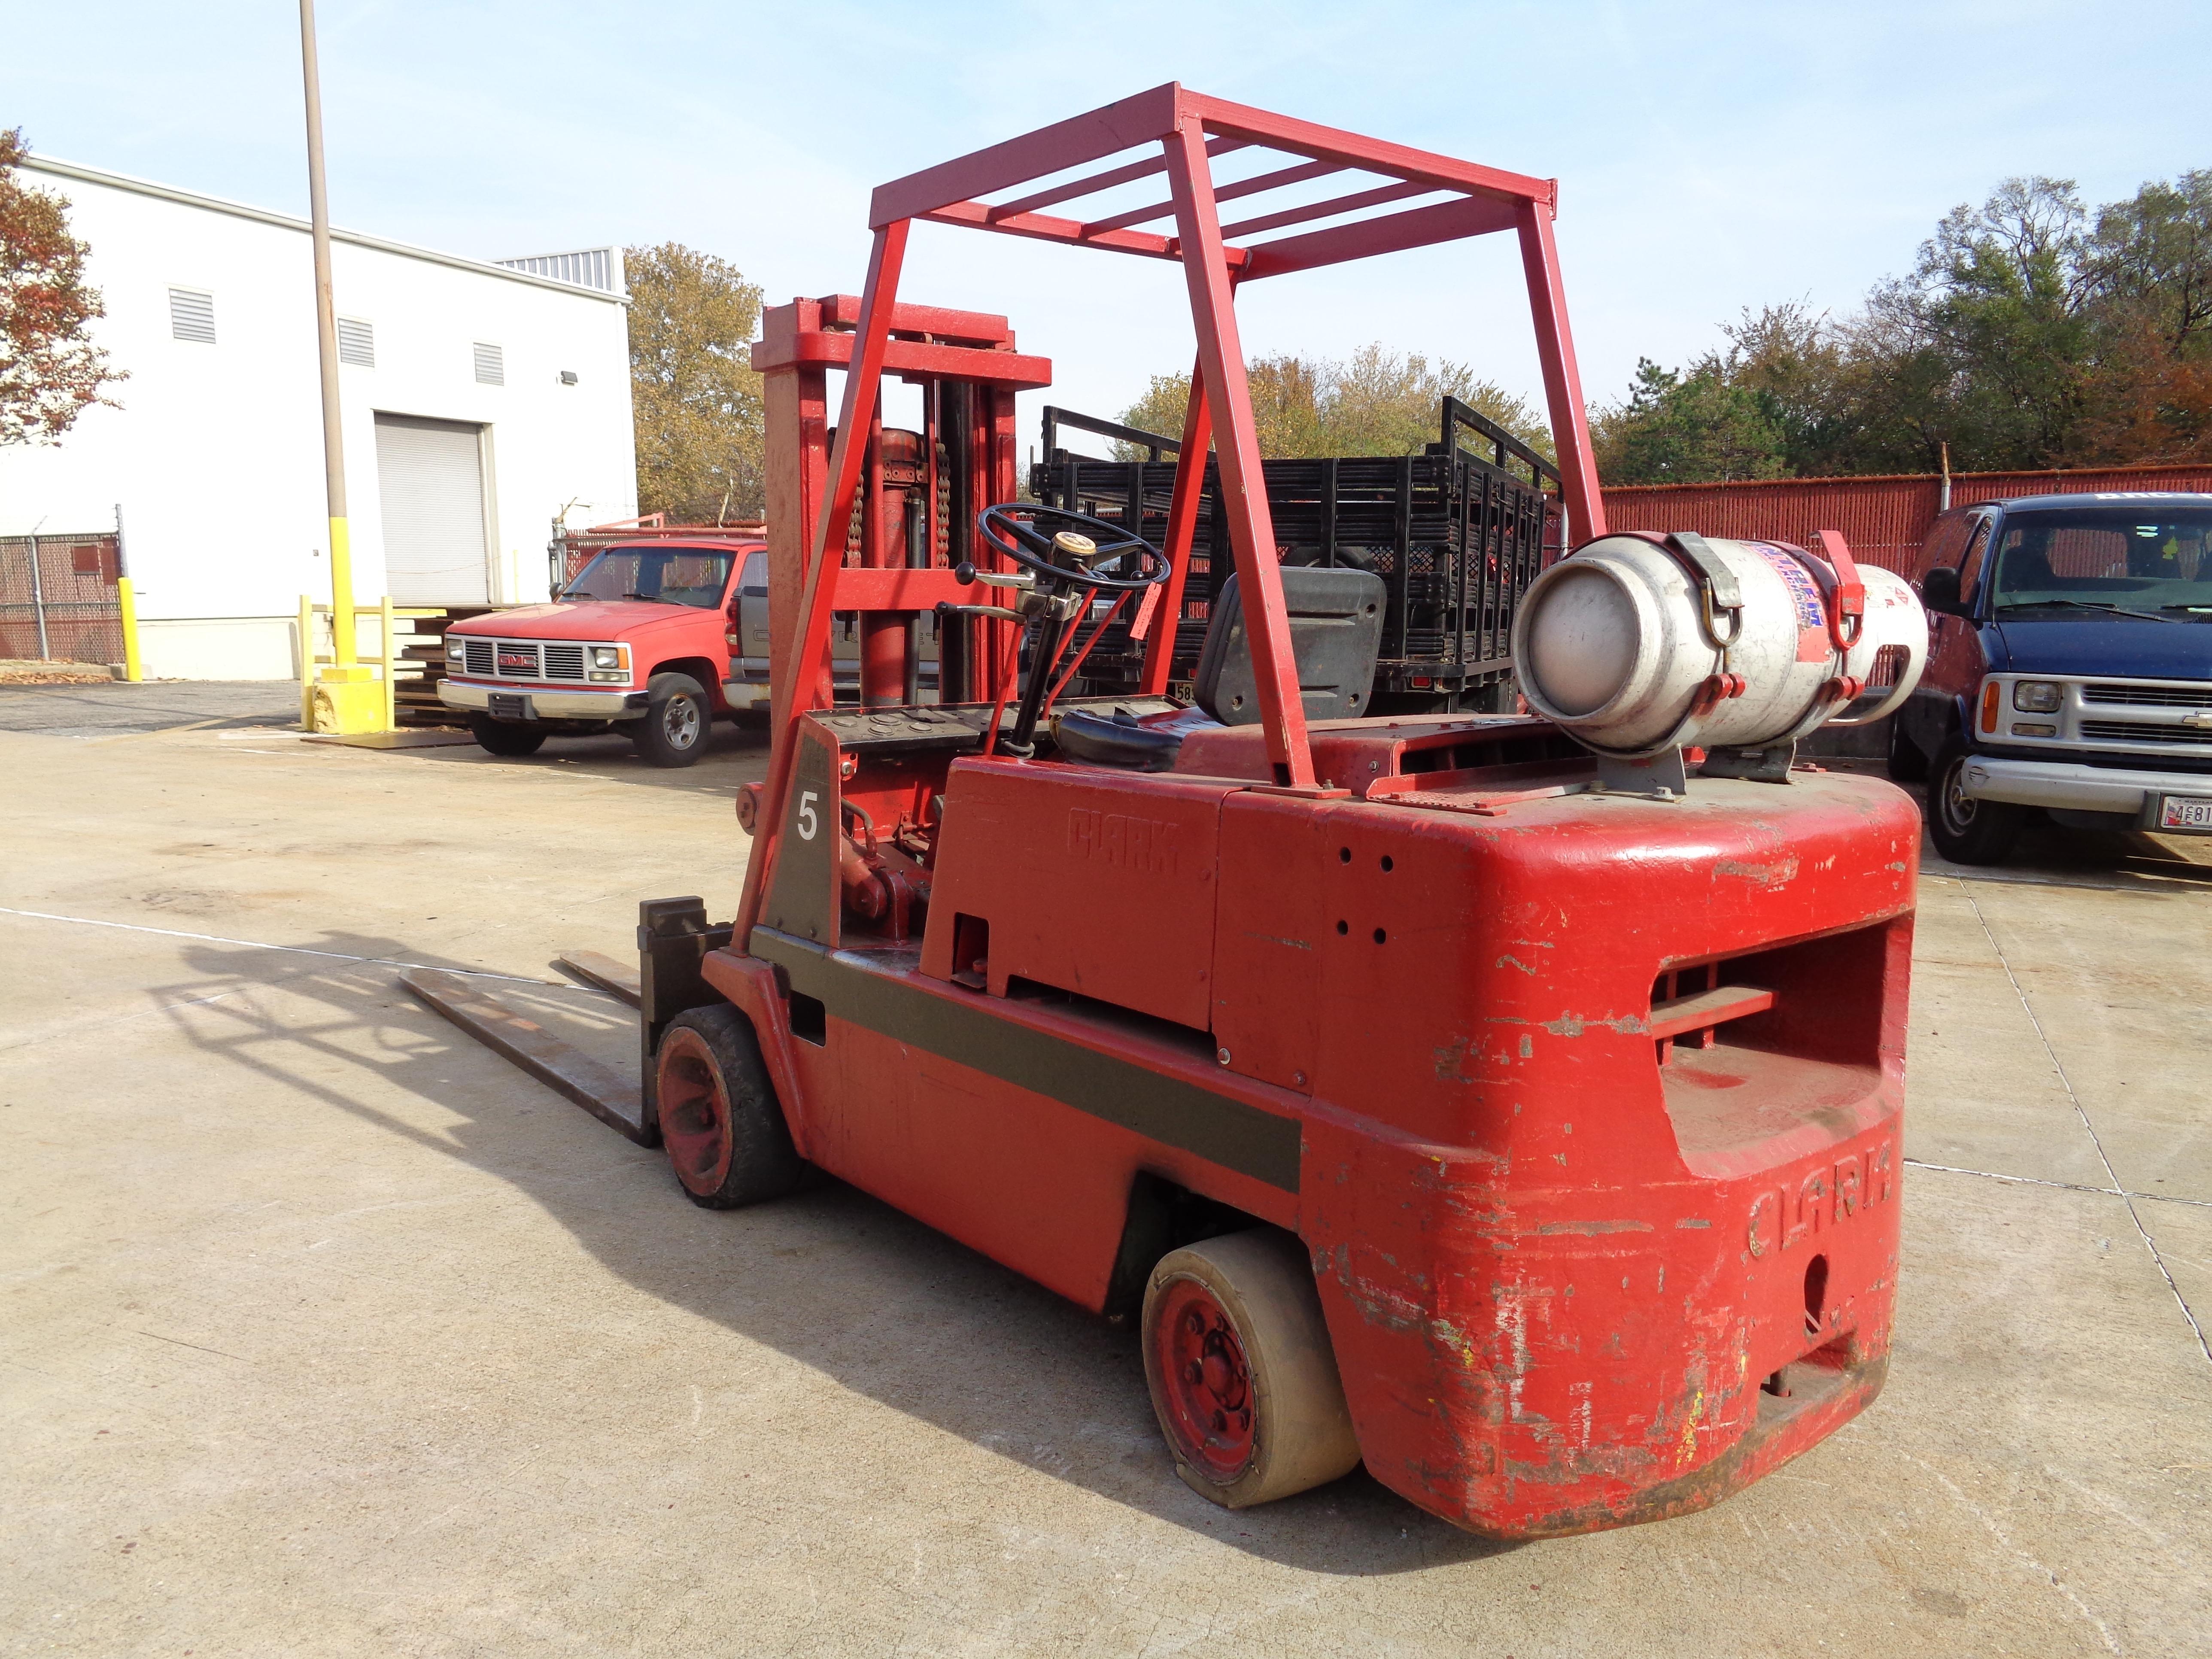 Clark C120-35 Forklift - 12,000 lbs - Image 3 of 6